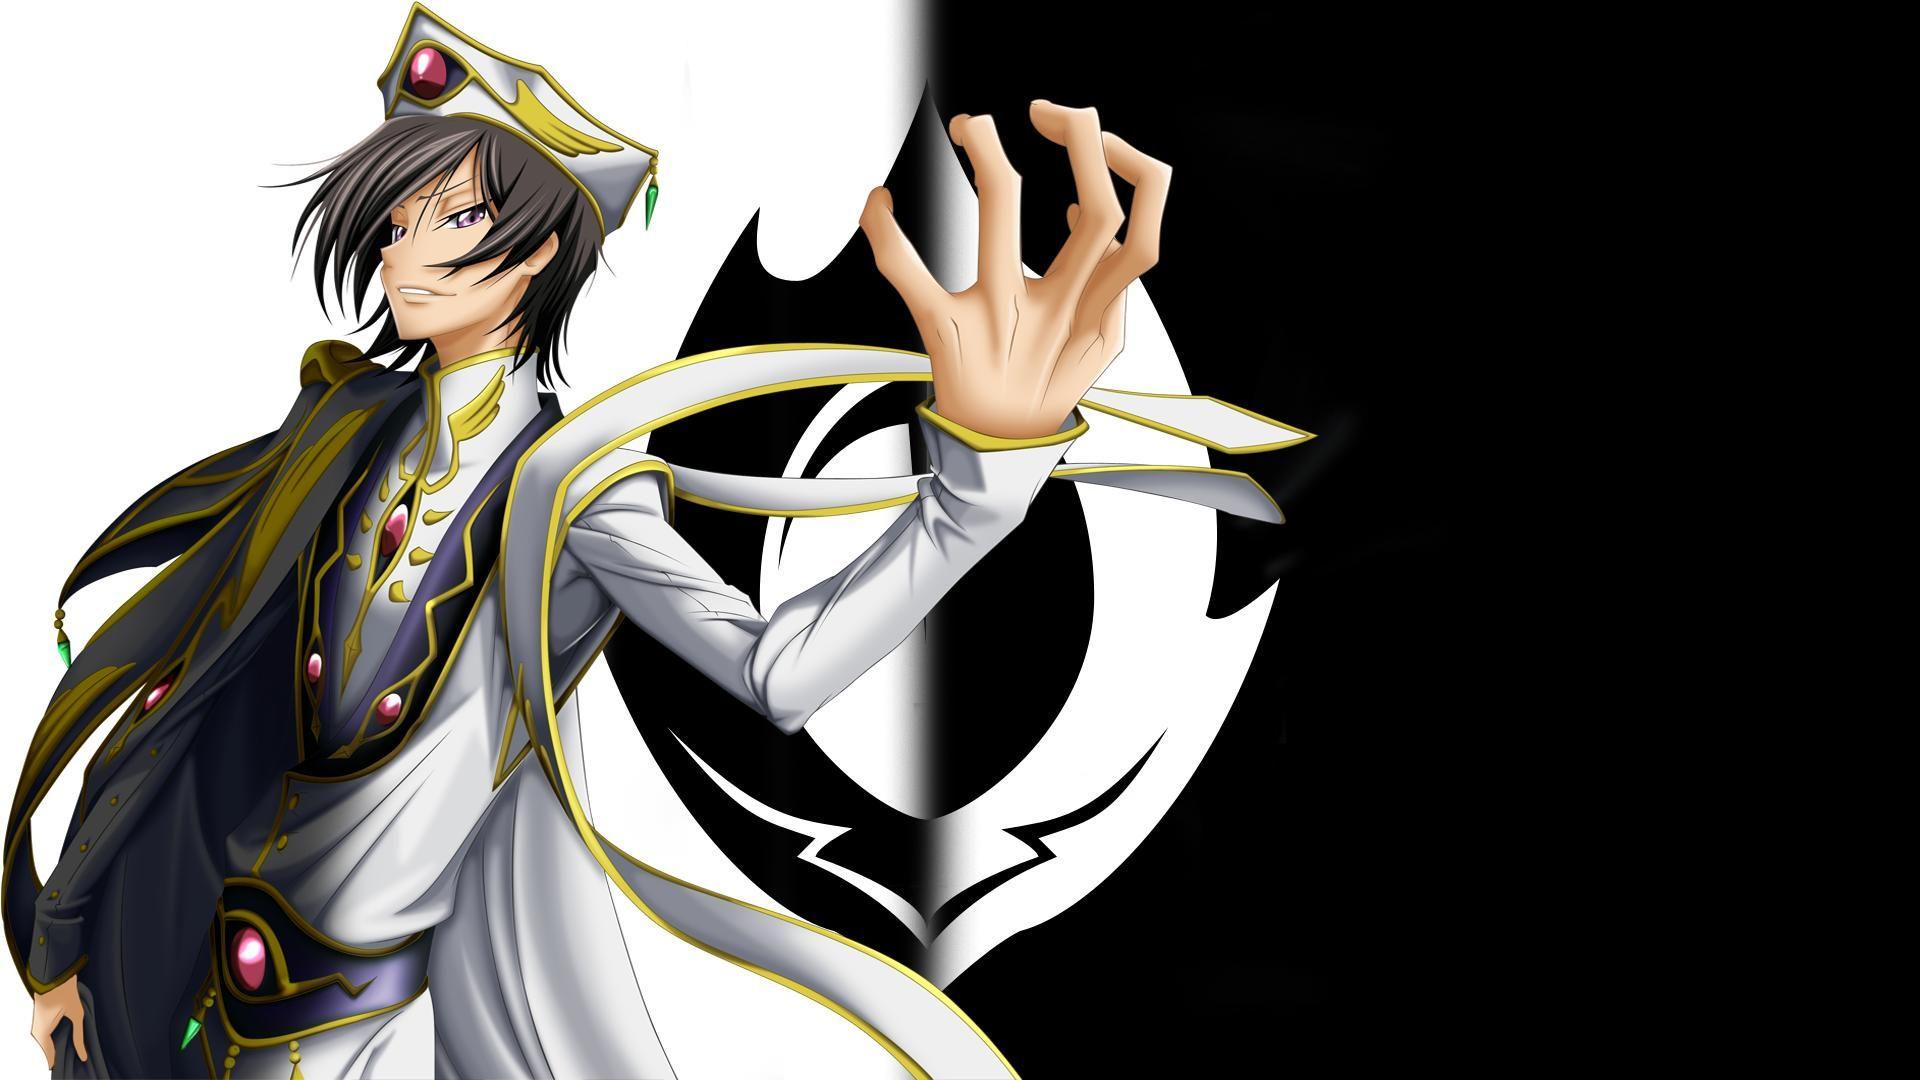 Les Mecs D Anime Les Plus Beaux Code Geass Wallpaper Code Geass Lelouch Lamperouge